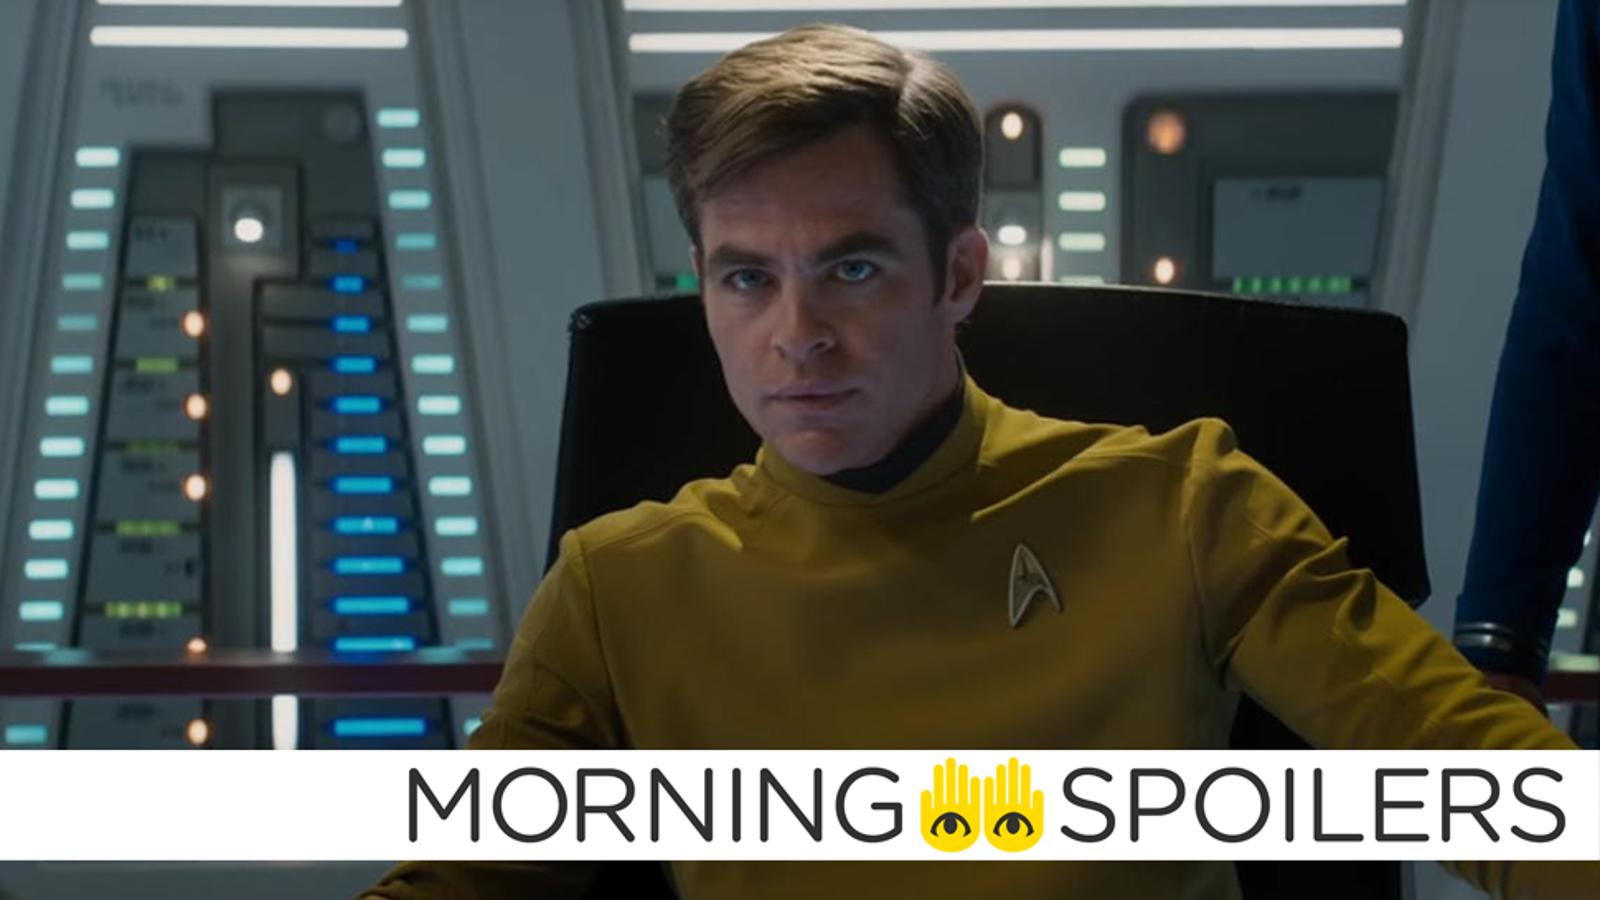 Chris Pine Still Has Hopes for His Star Trek Future